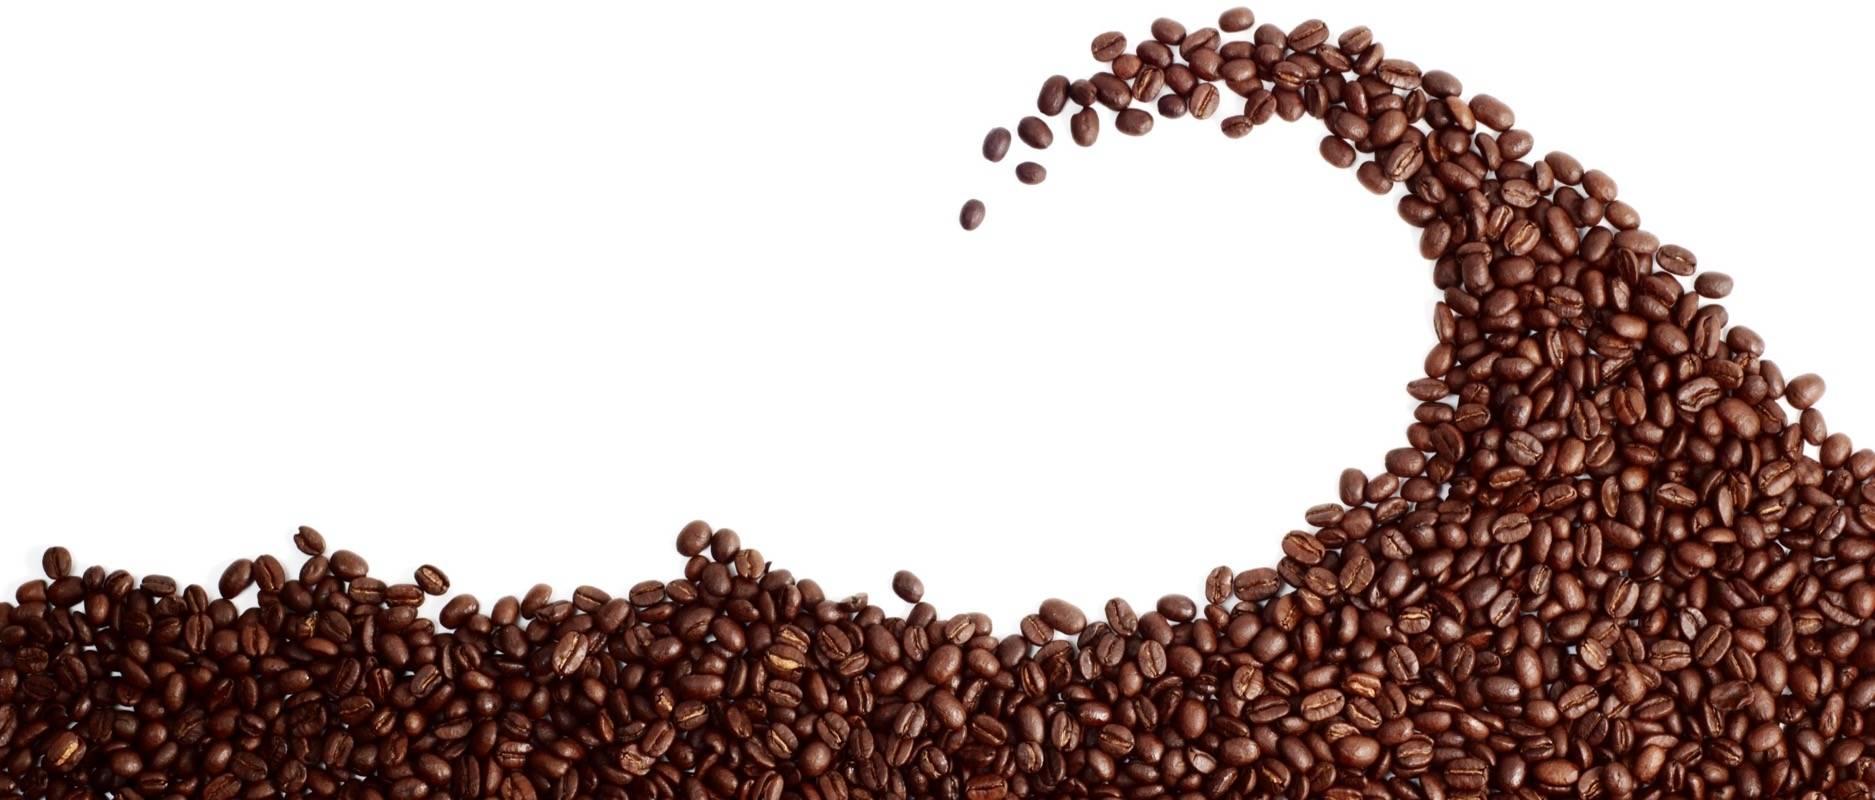 Waves of coffee